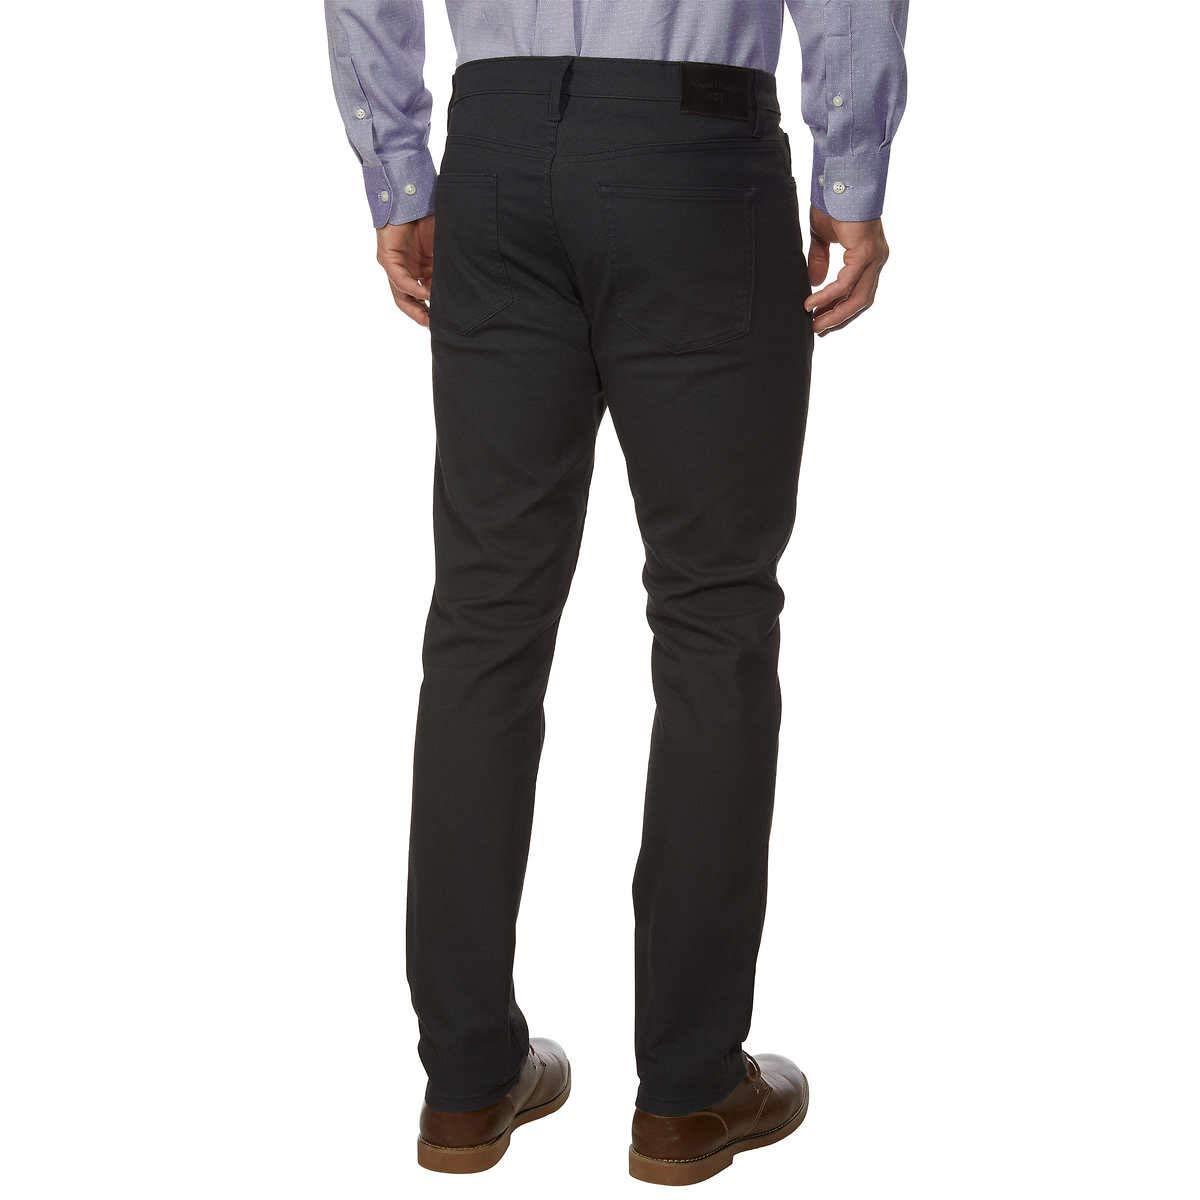 English Laundry Men/'s 365 Pant 32x32, Steel